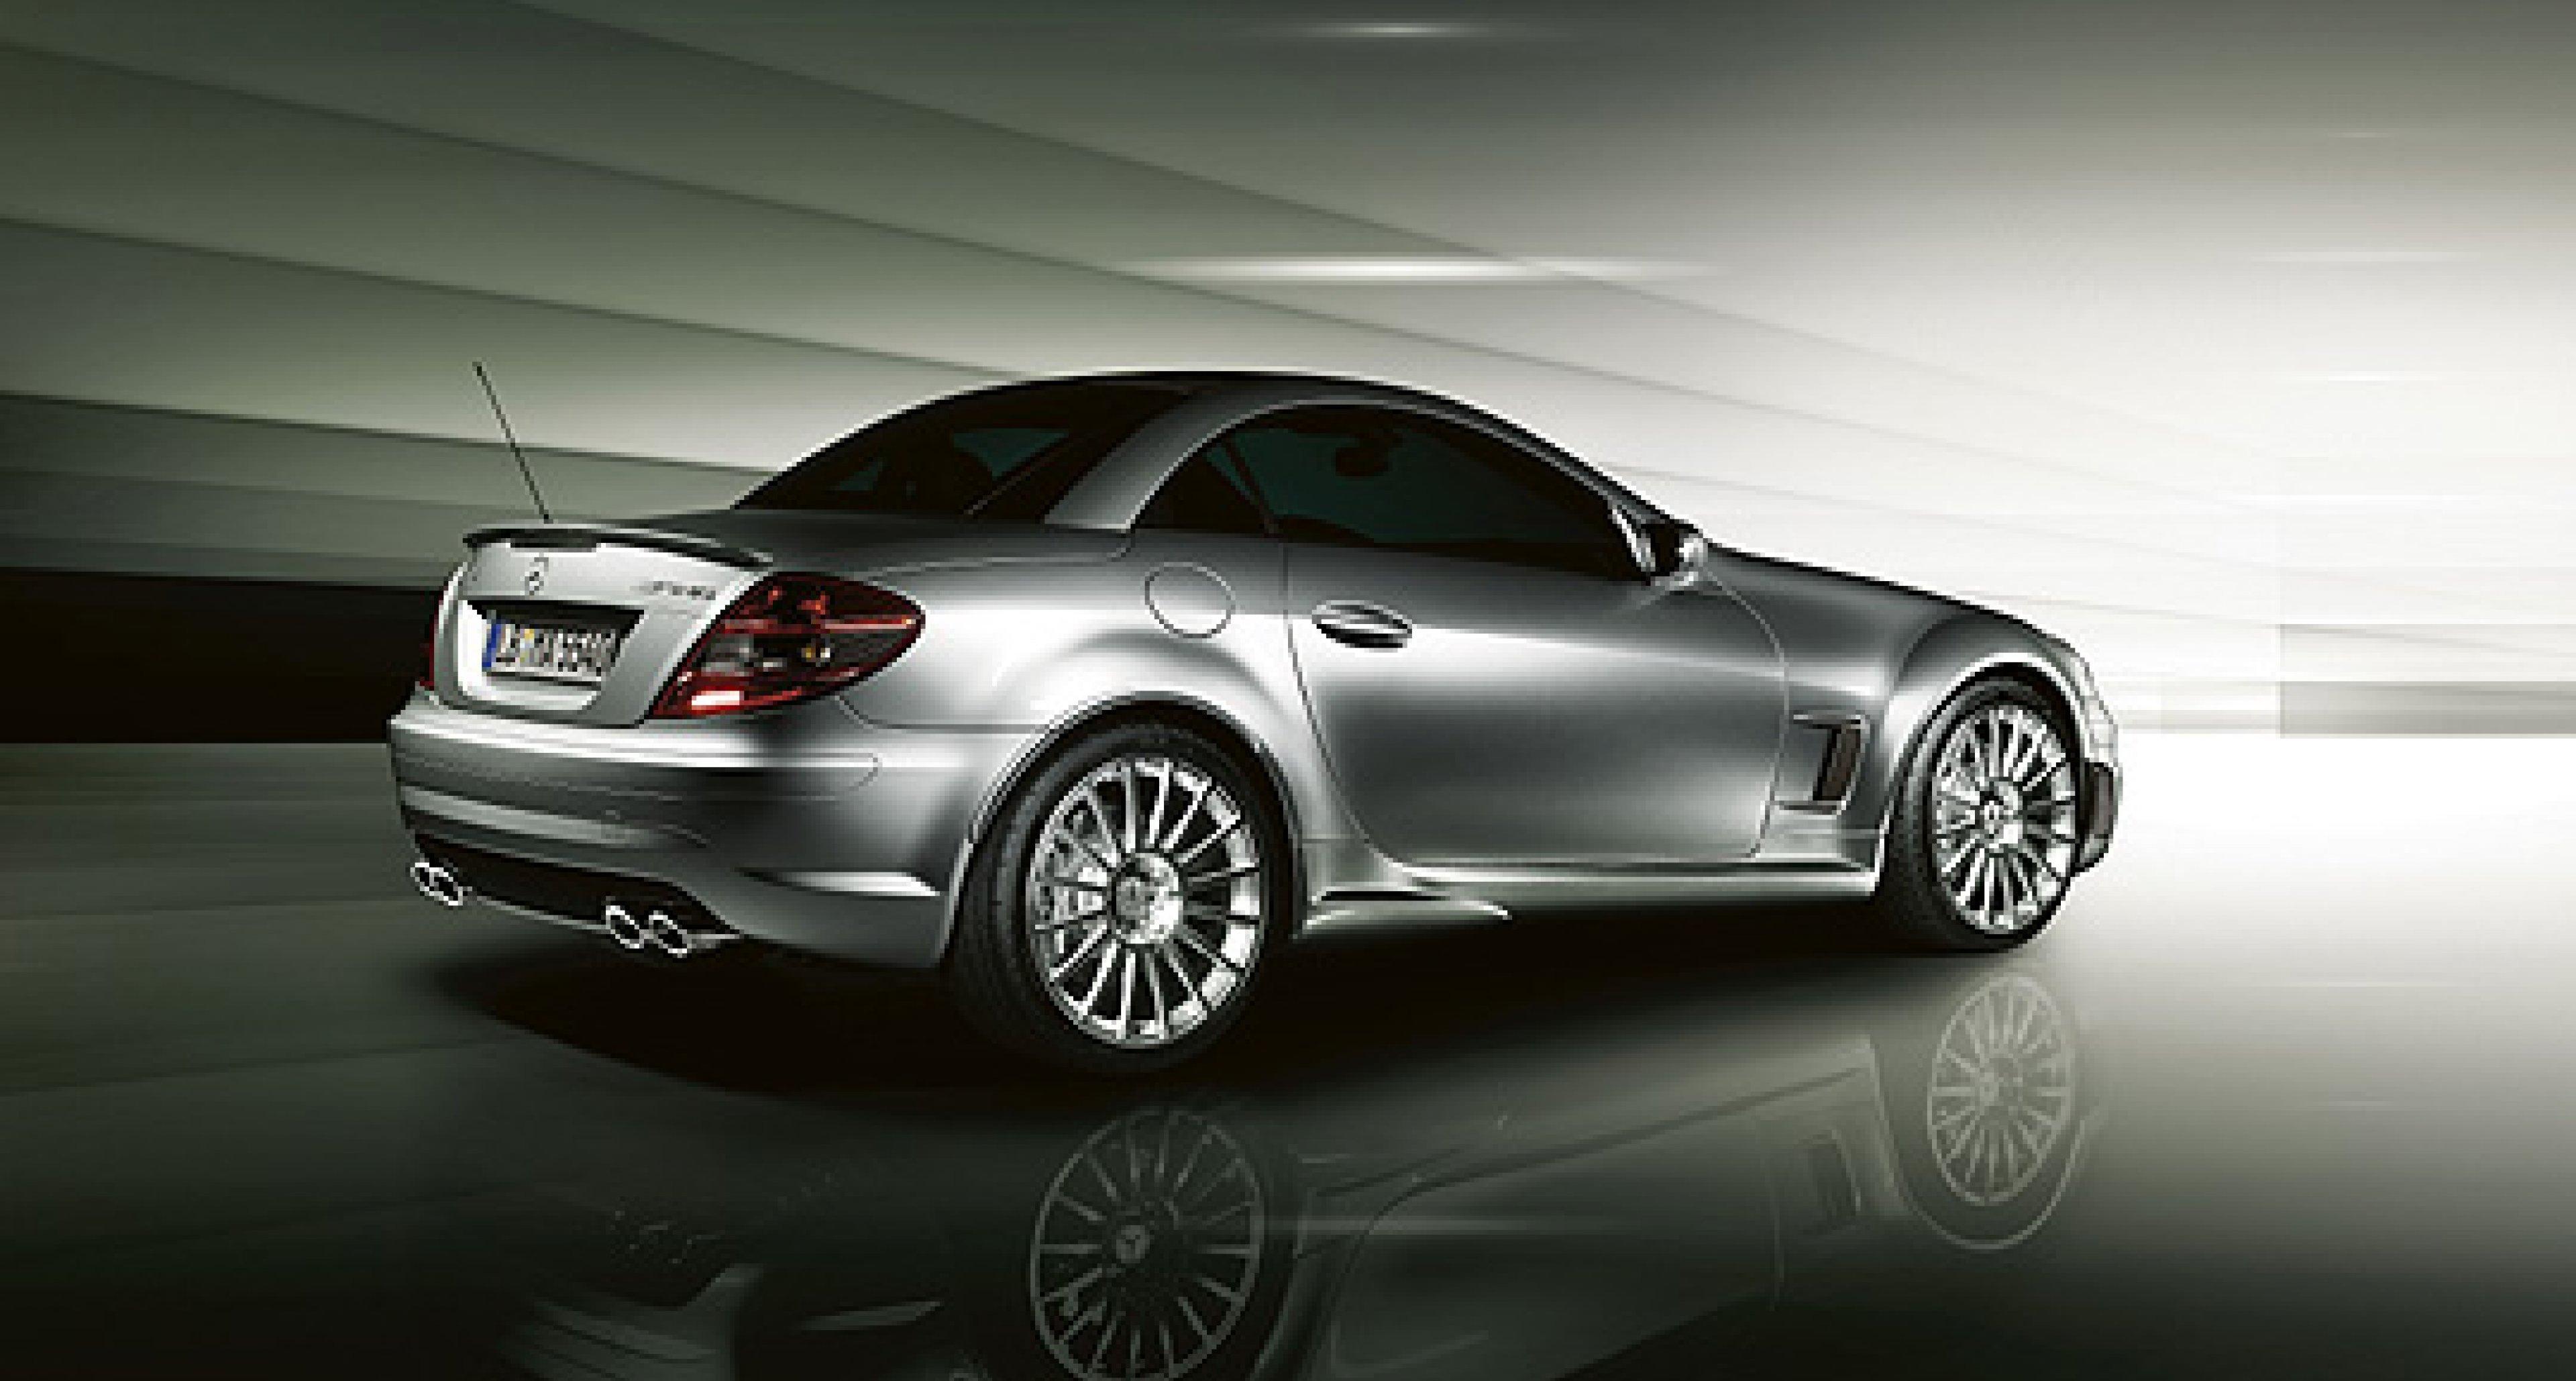 The Mercedes-Benz SLK 55 AMG special series